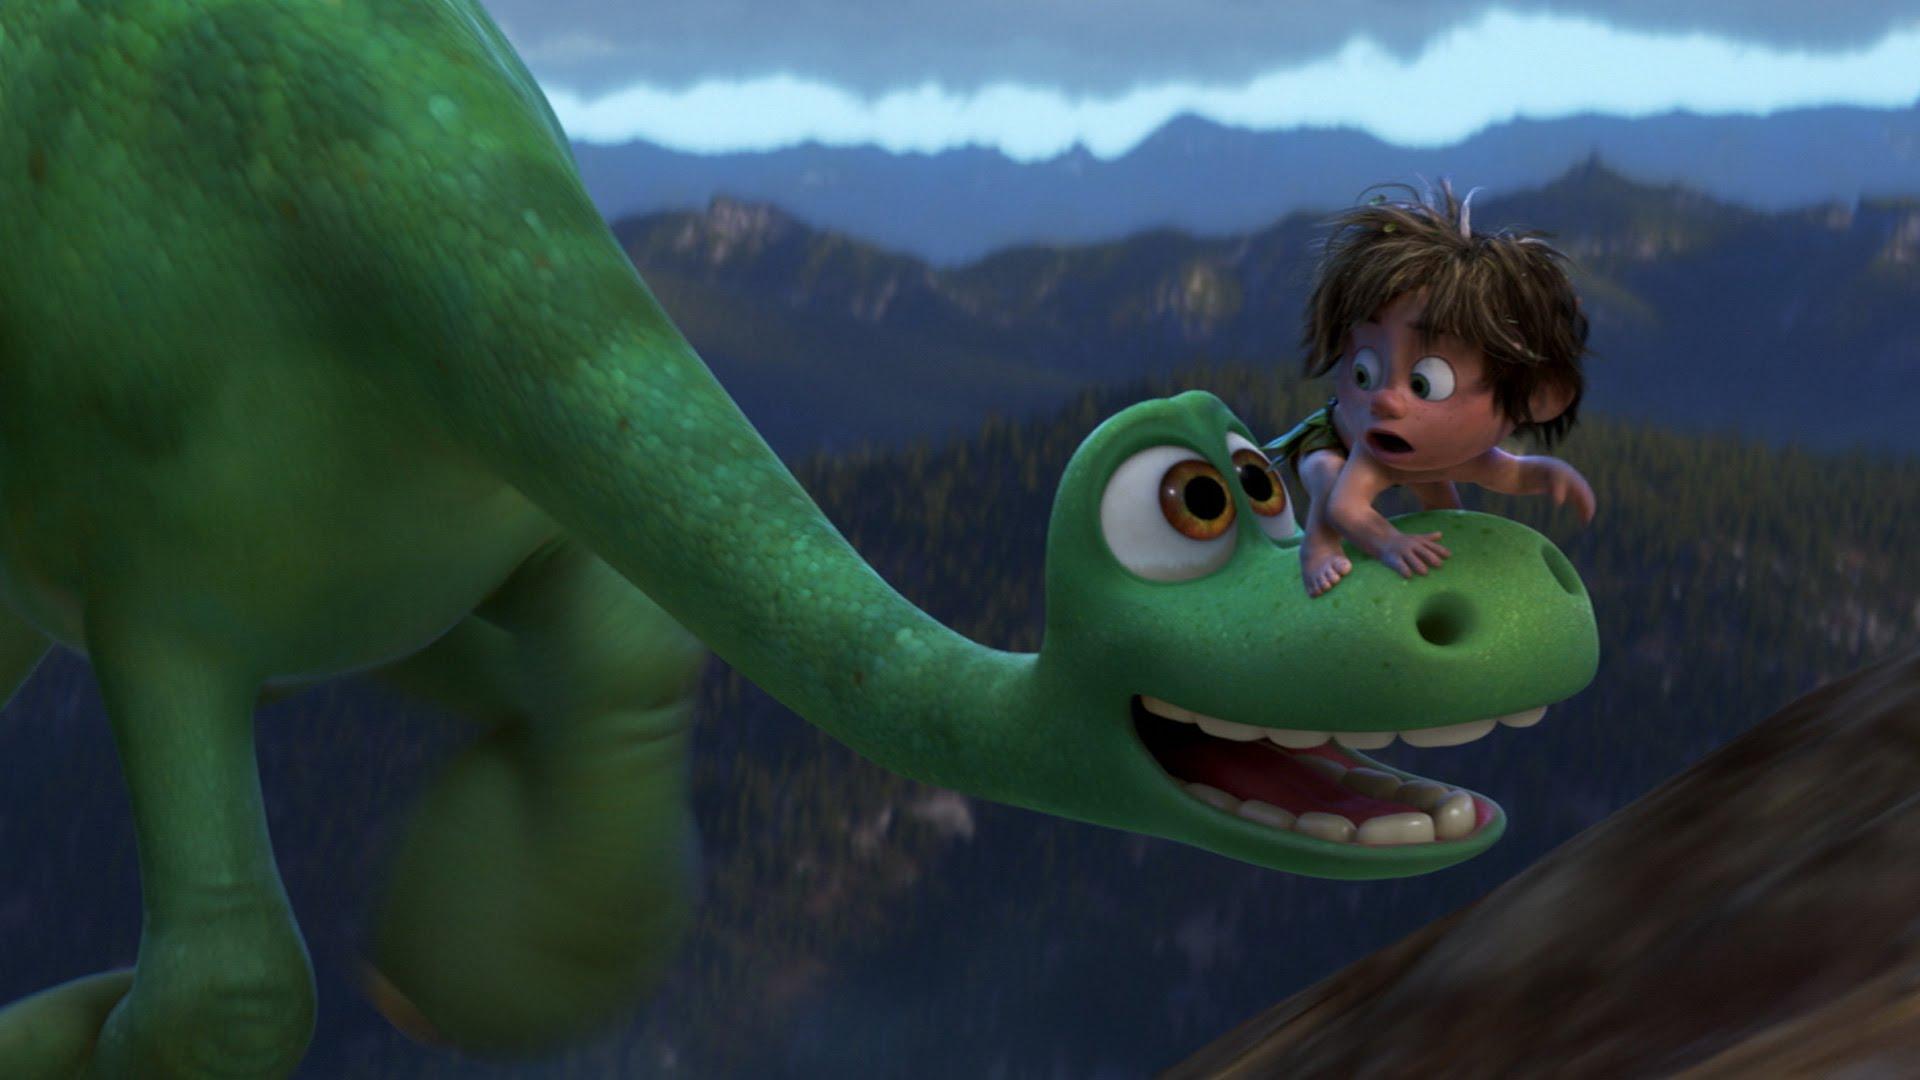 The Good Dinosaur Wallpaper The Good Dinosaur HD Movie